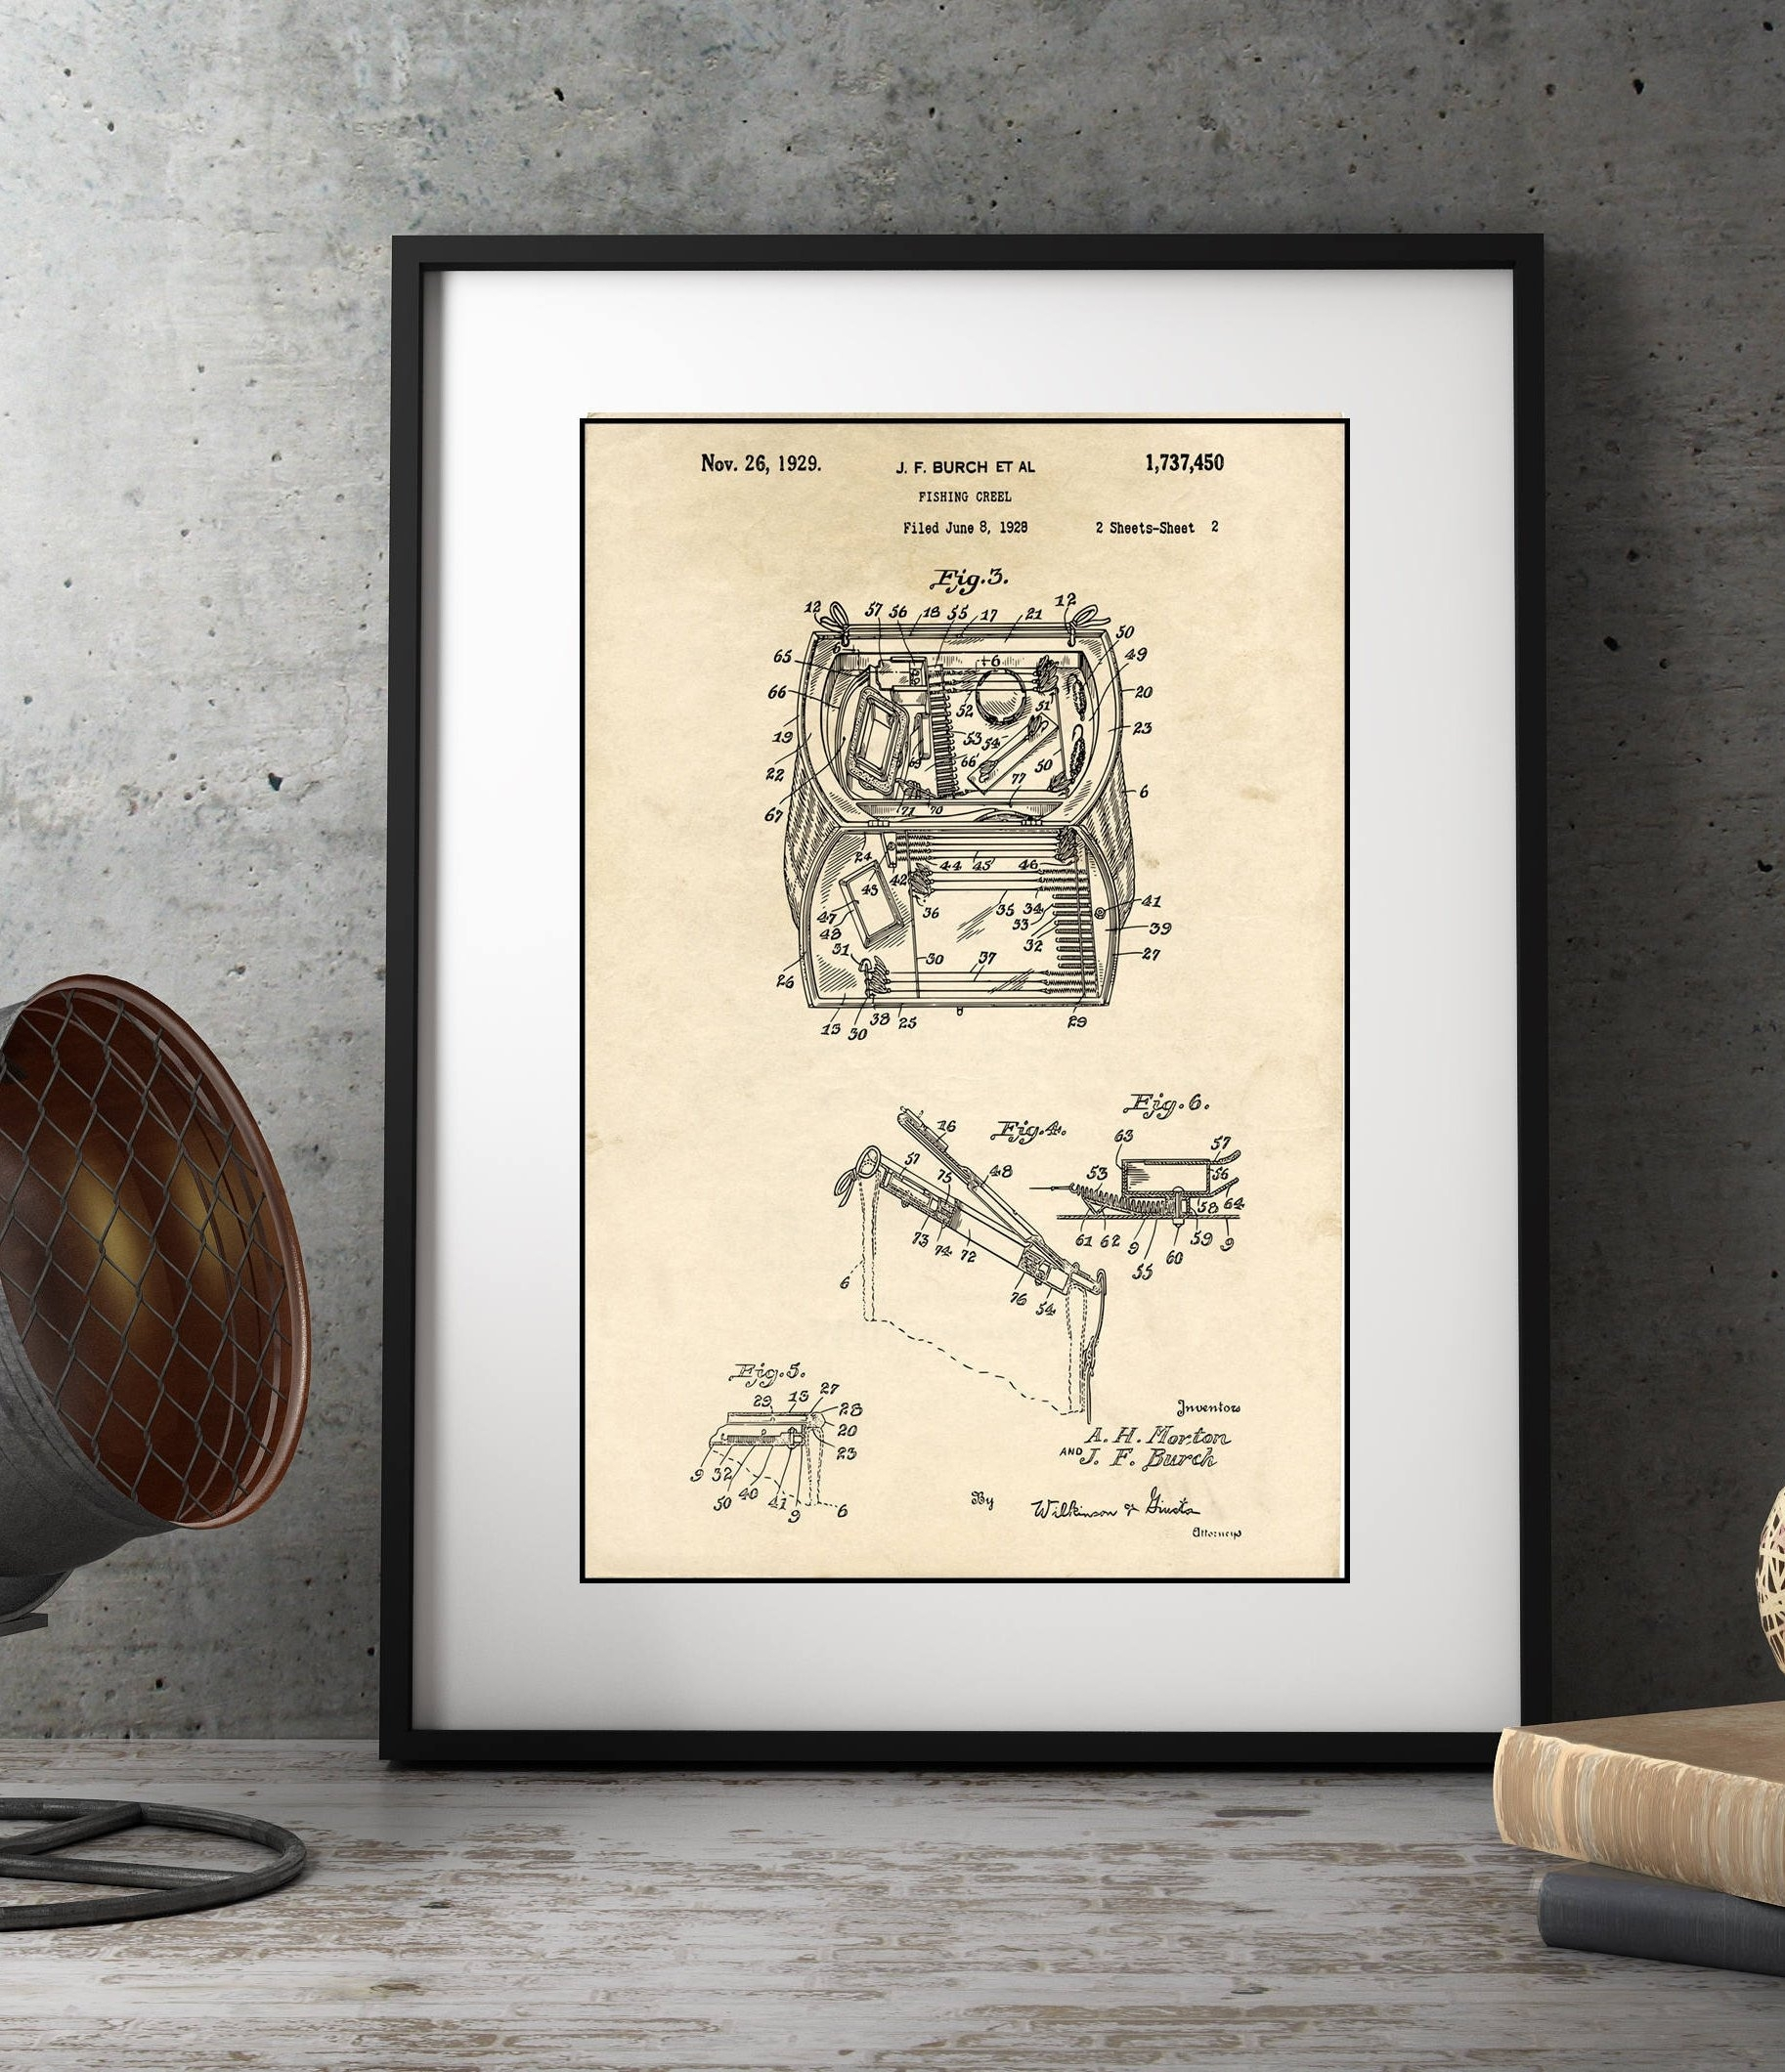 Lake House Decor, Fishing Creel Patent Illustration, Farmhouse Decor Inside Latest Lake House Wall Art (View 13 of 15)